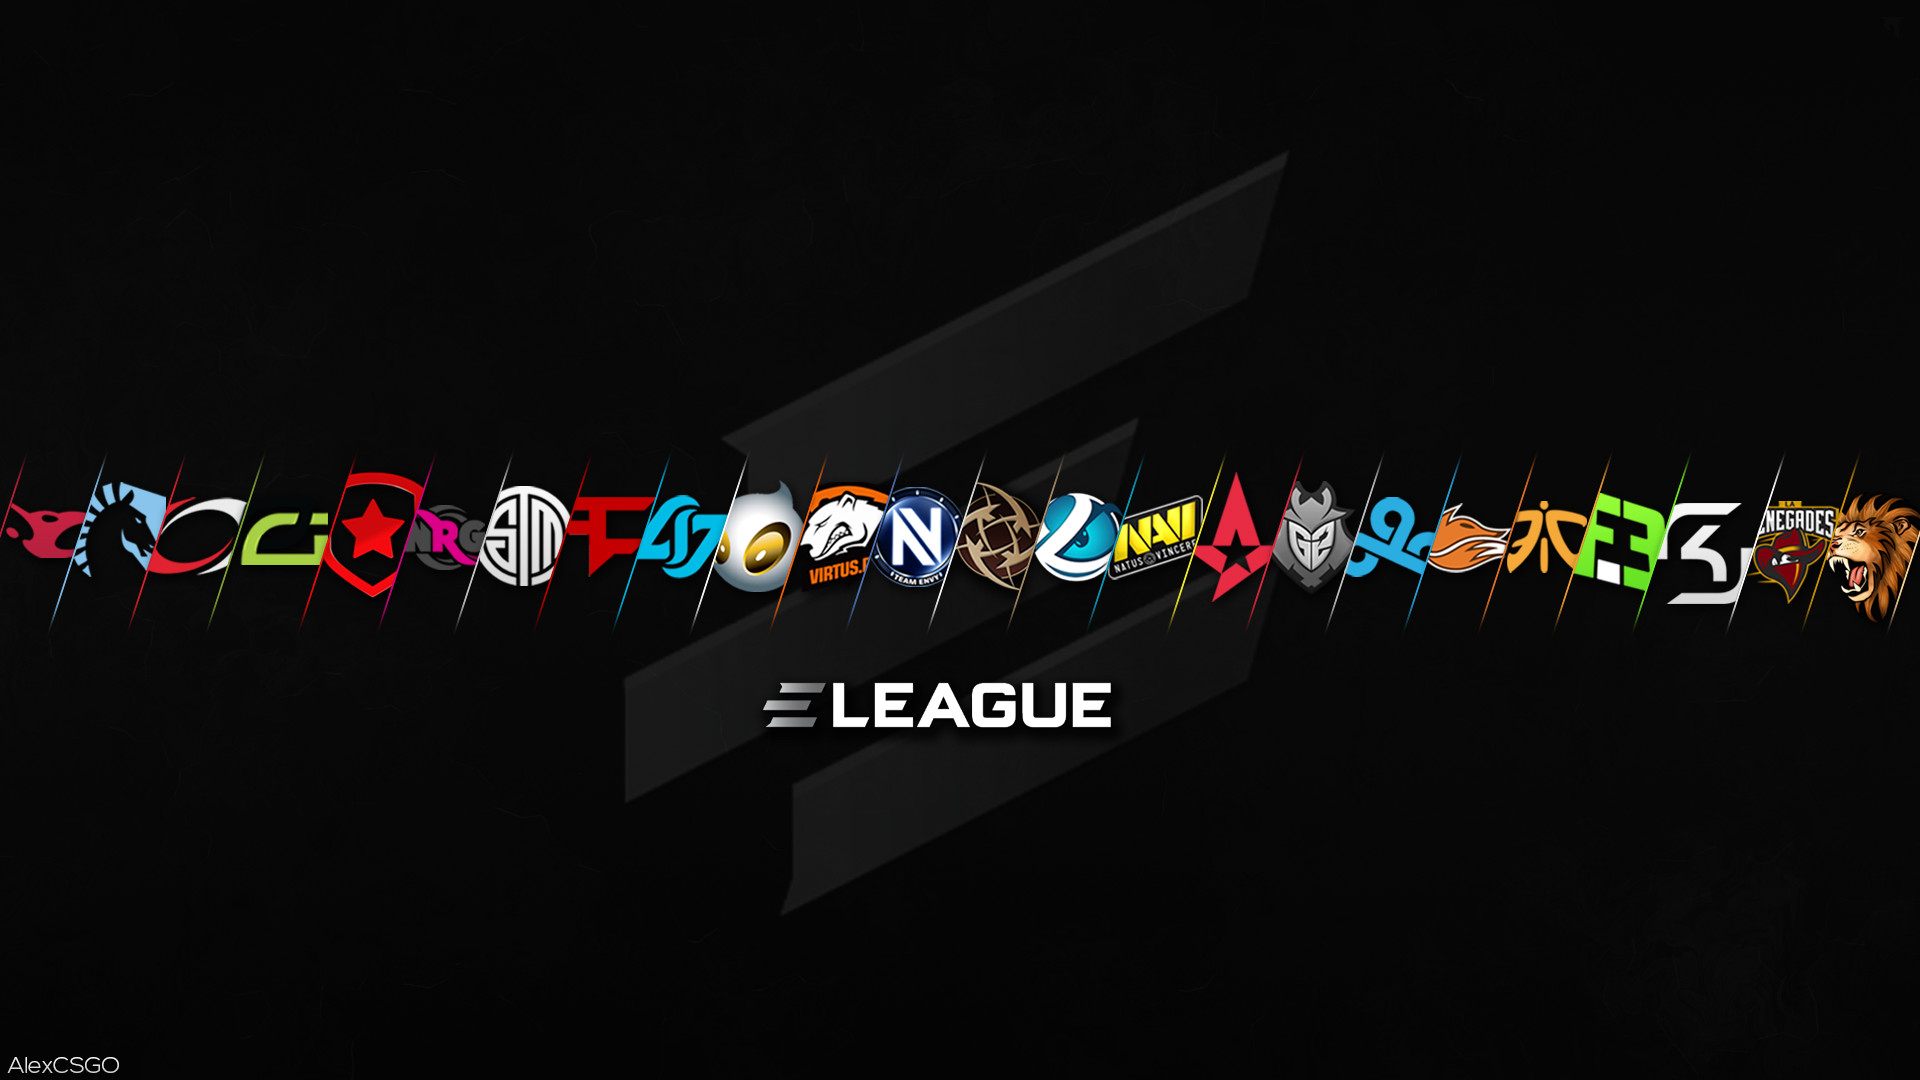 E-League Wallpaper